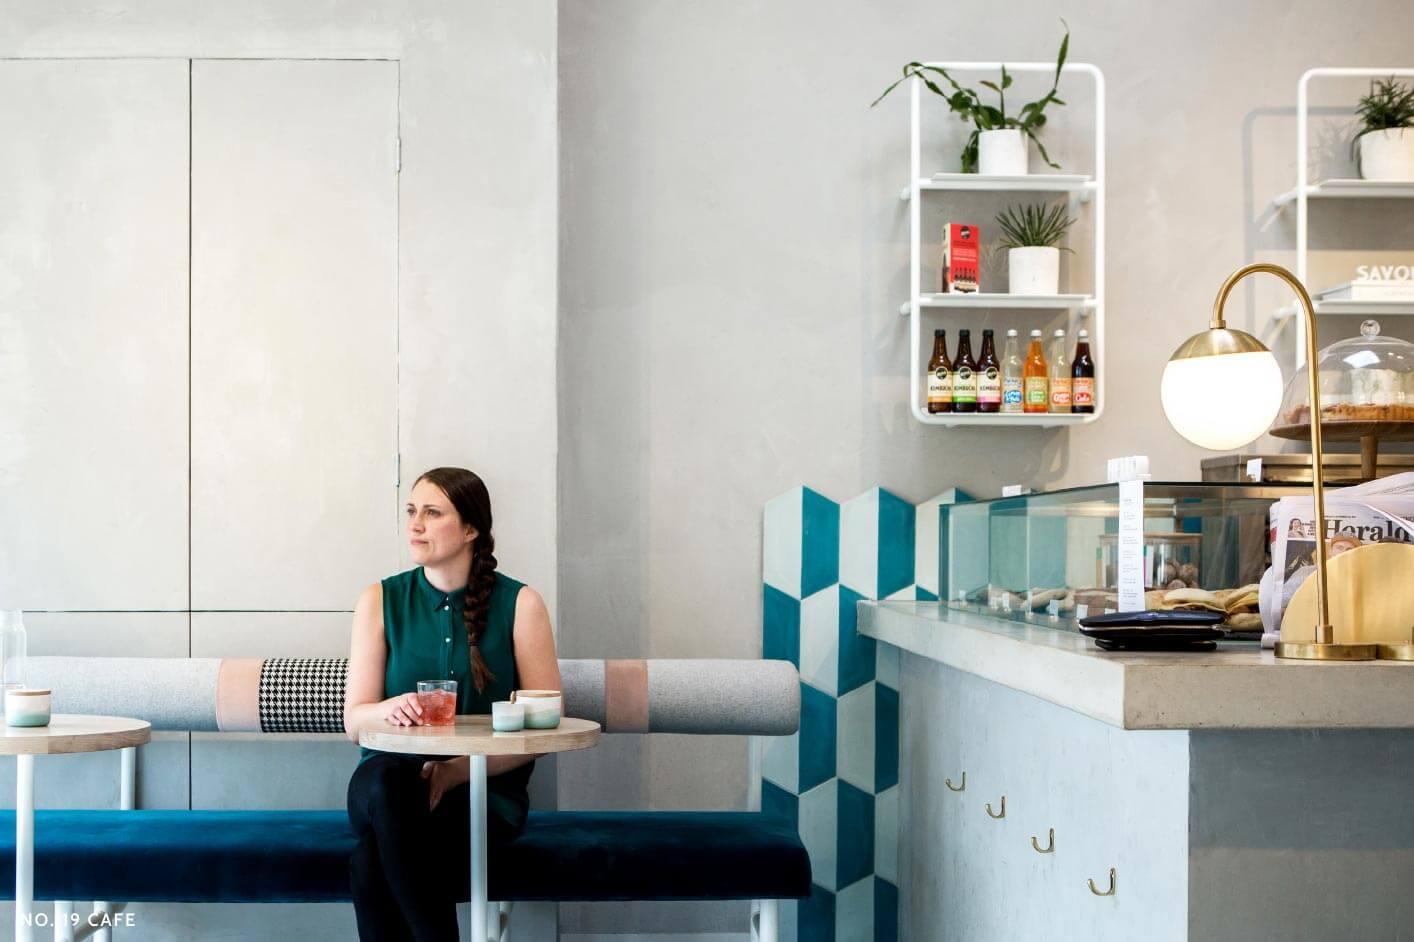 No 19 Cafe | Leonard & Lane